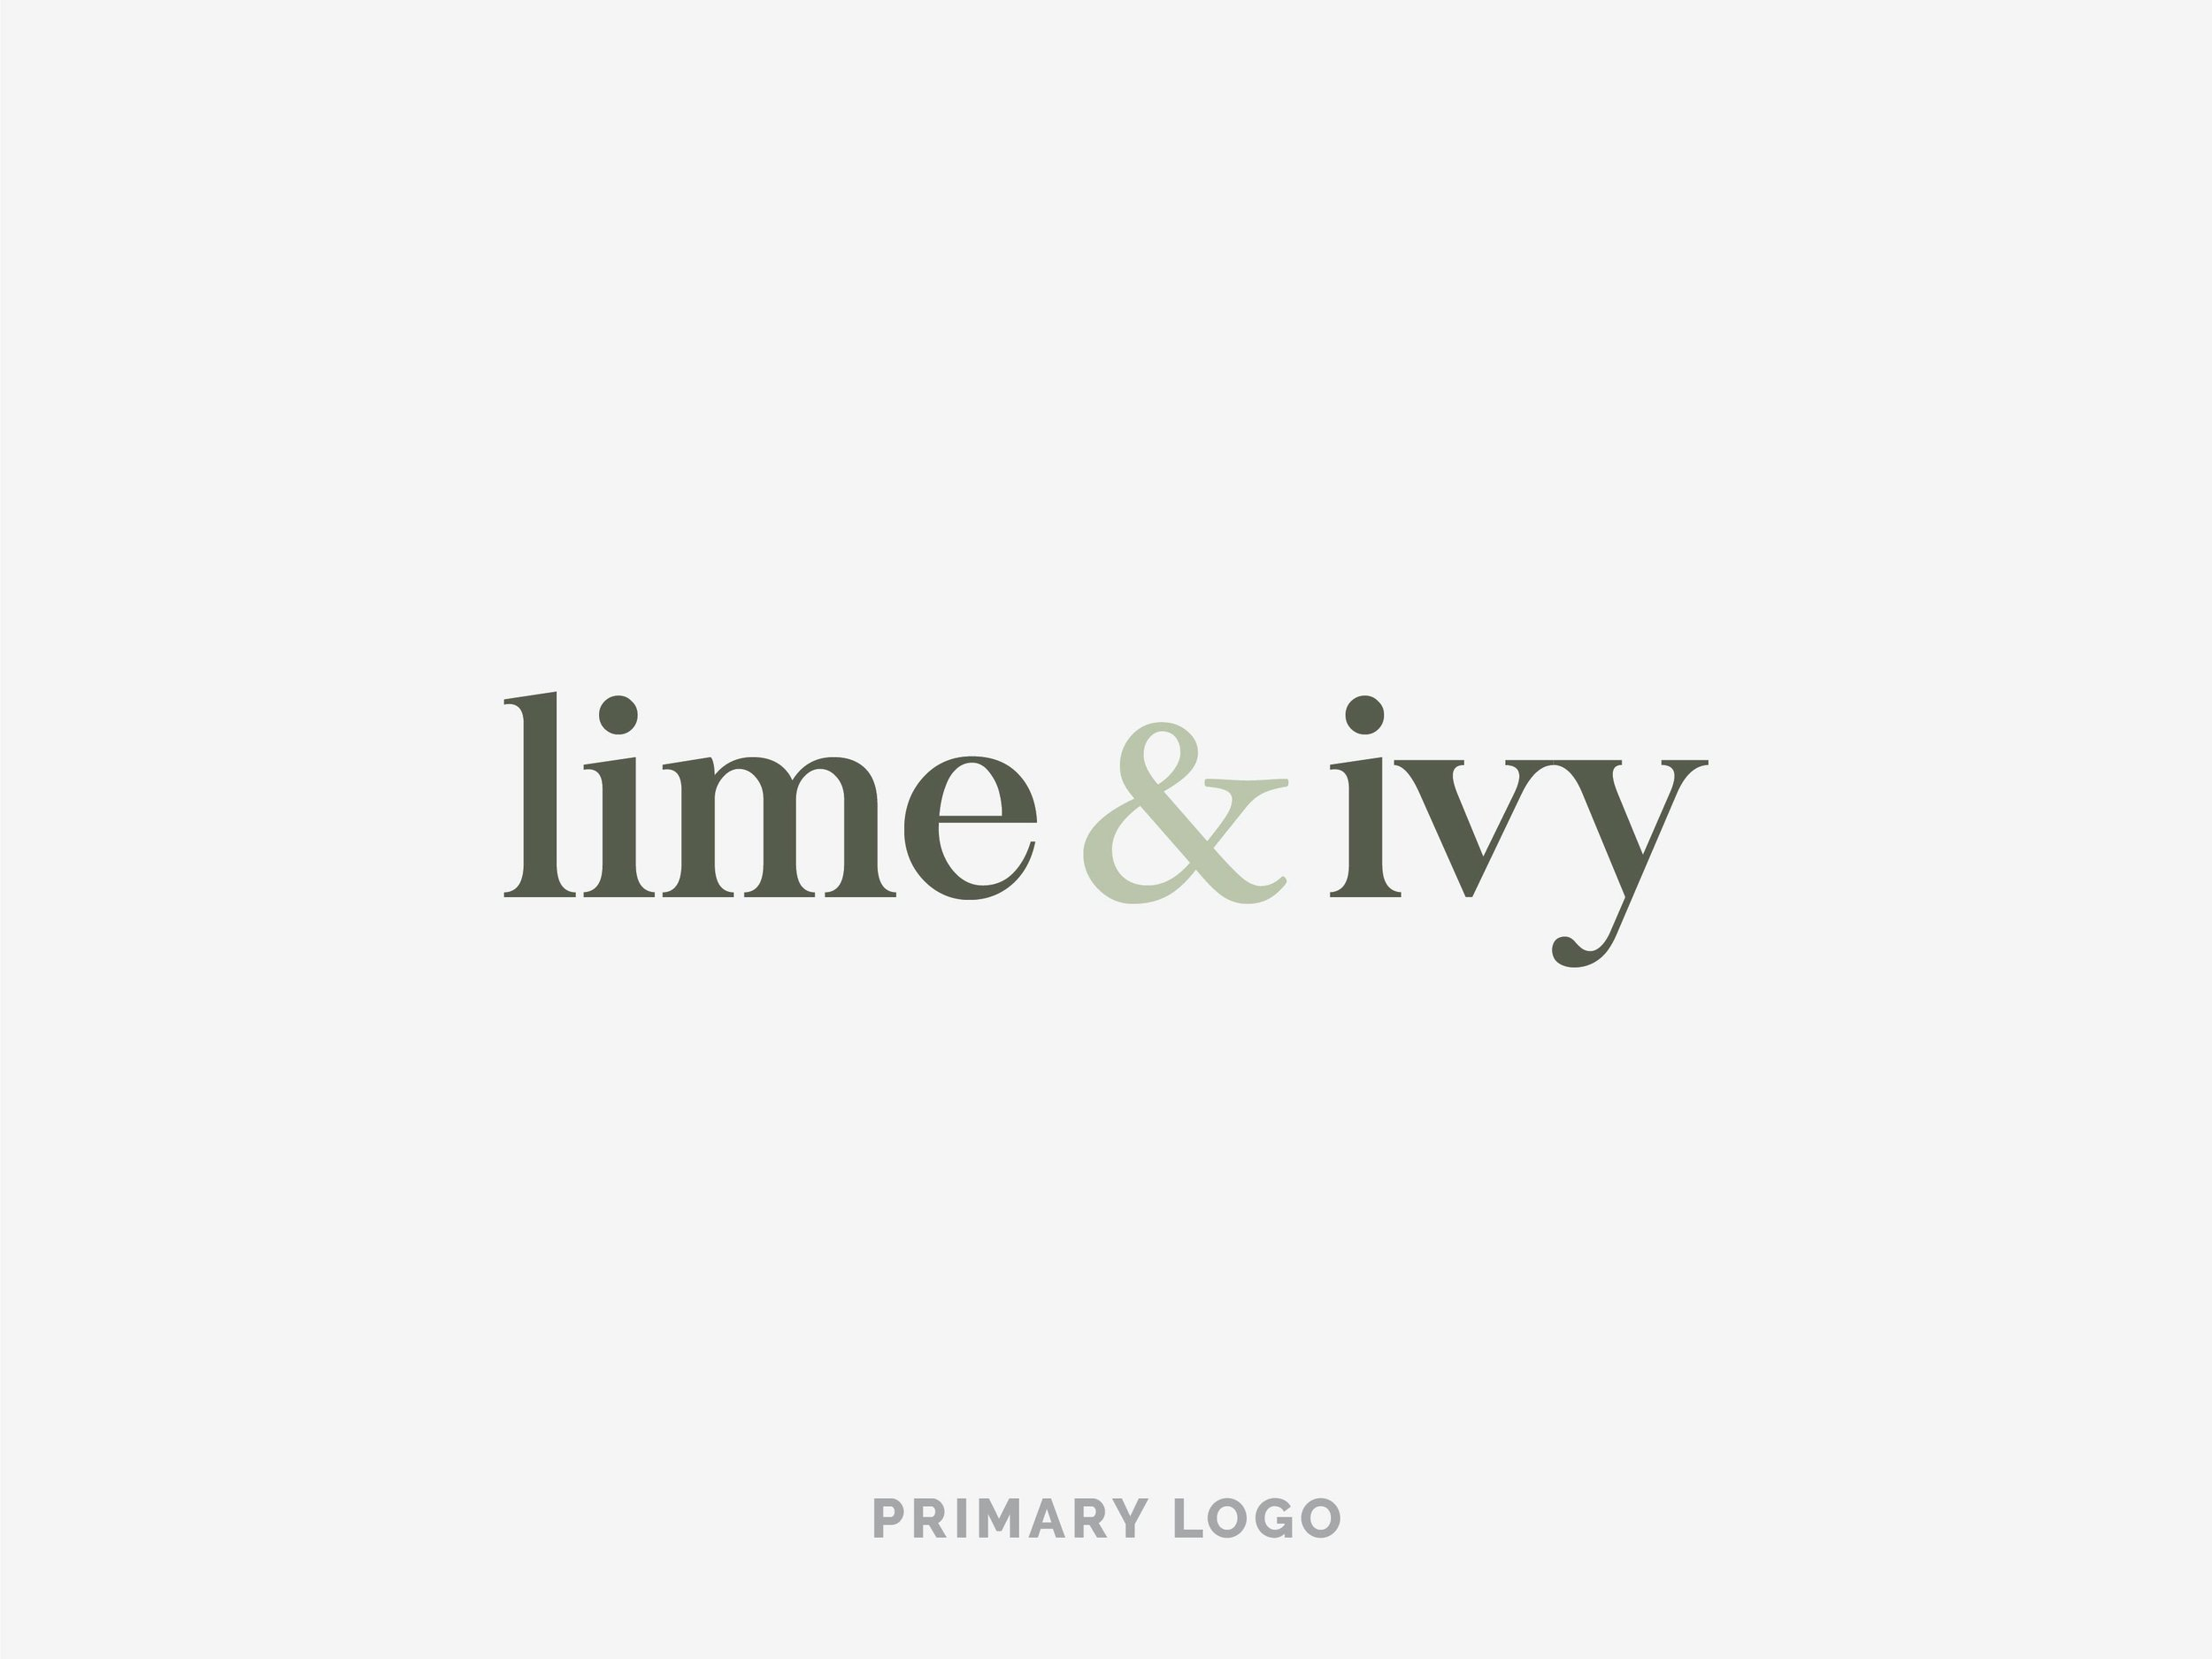 limeandivy1.jpg